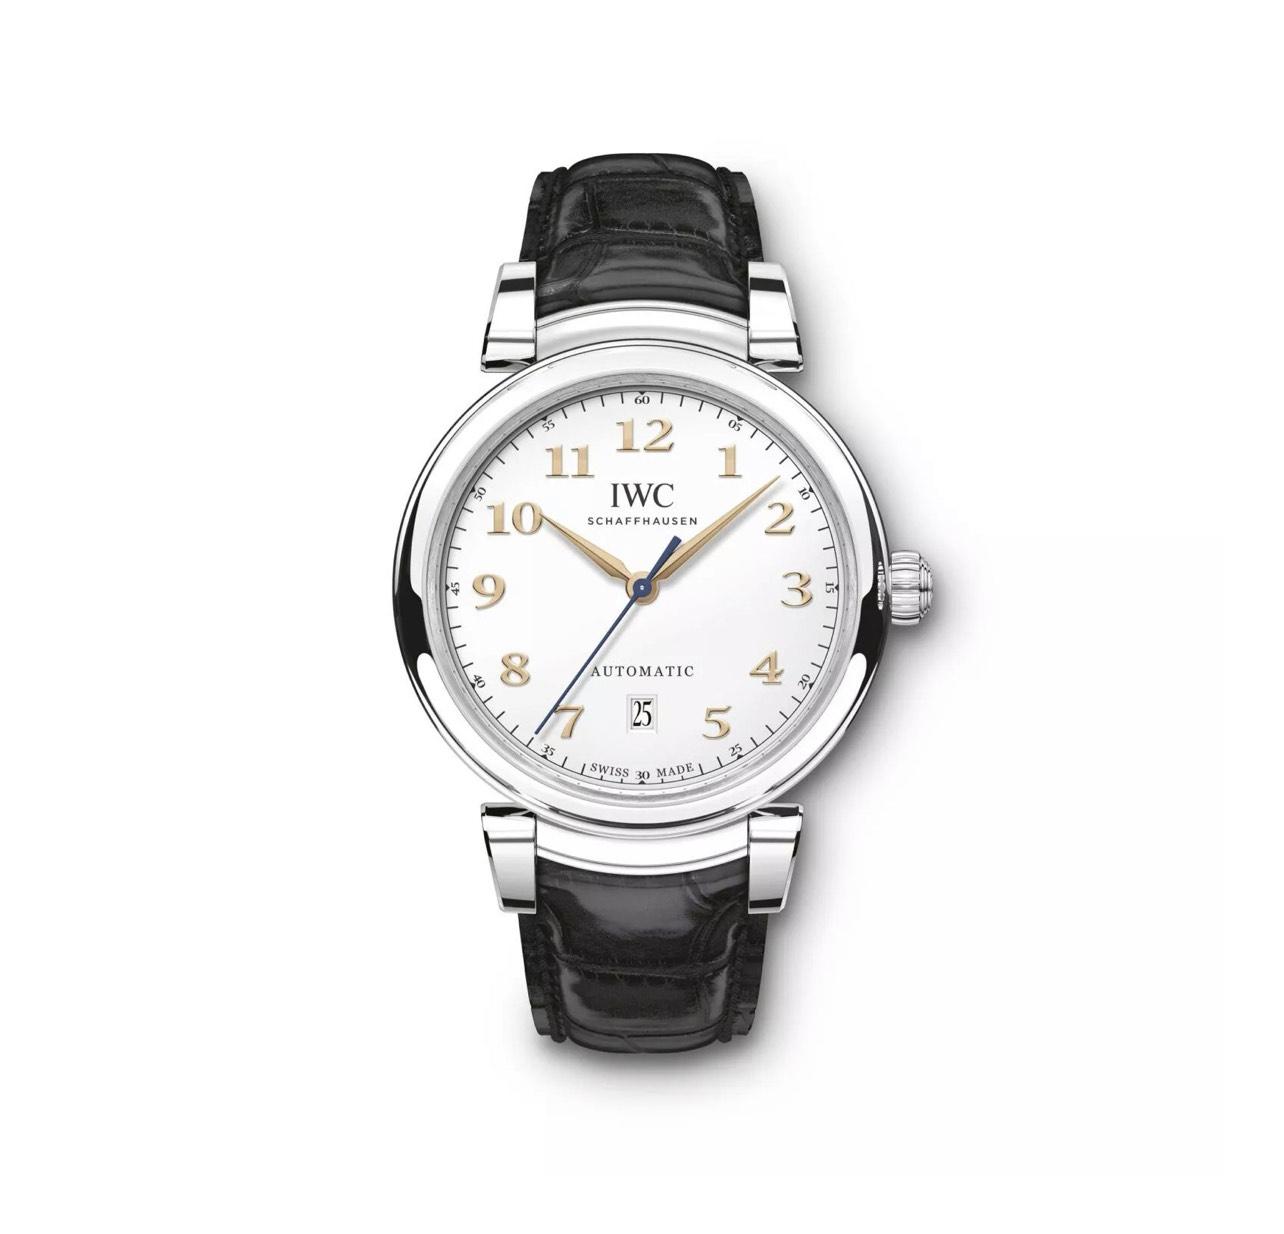 IWC Da Vinci Automatic 40mm Men's Watch £3832 @ David M Robinson